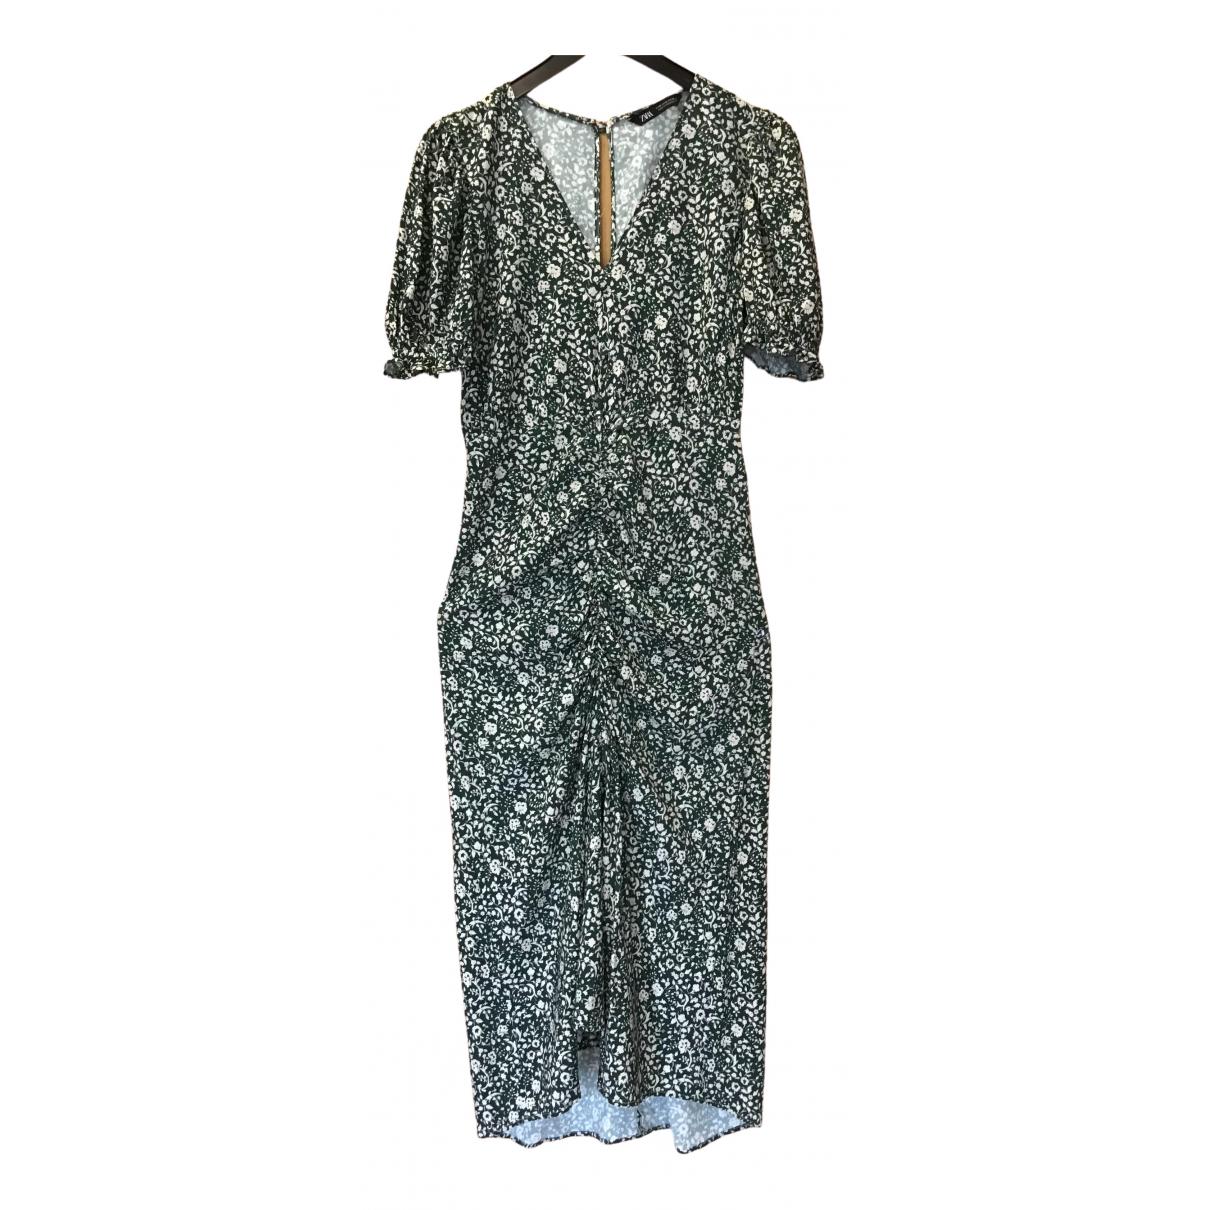 Zara \N Green dress for Women 38 FR